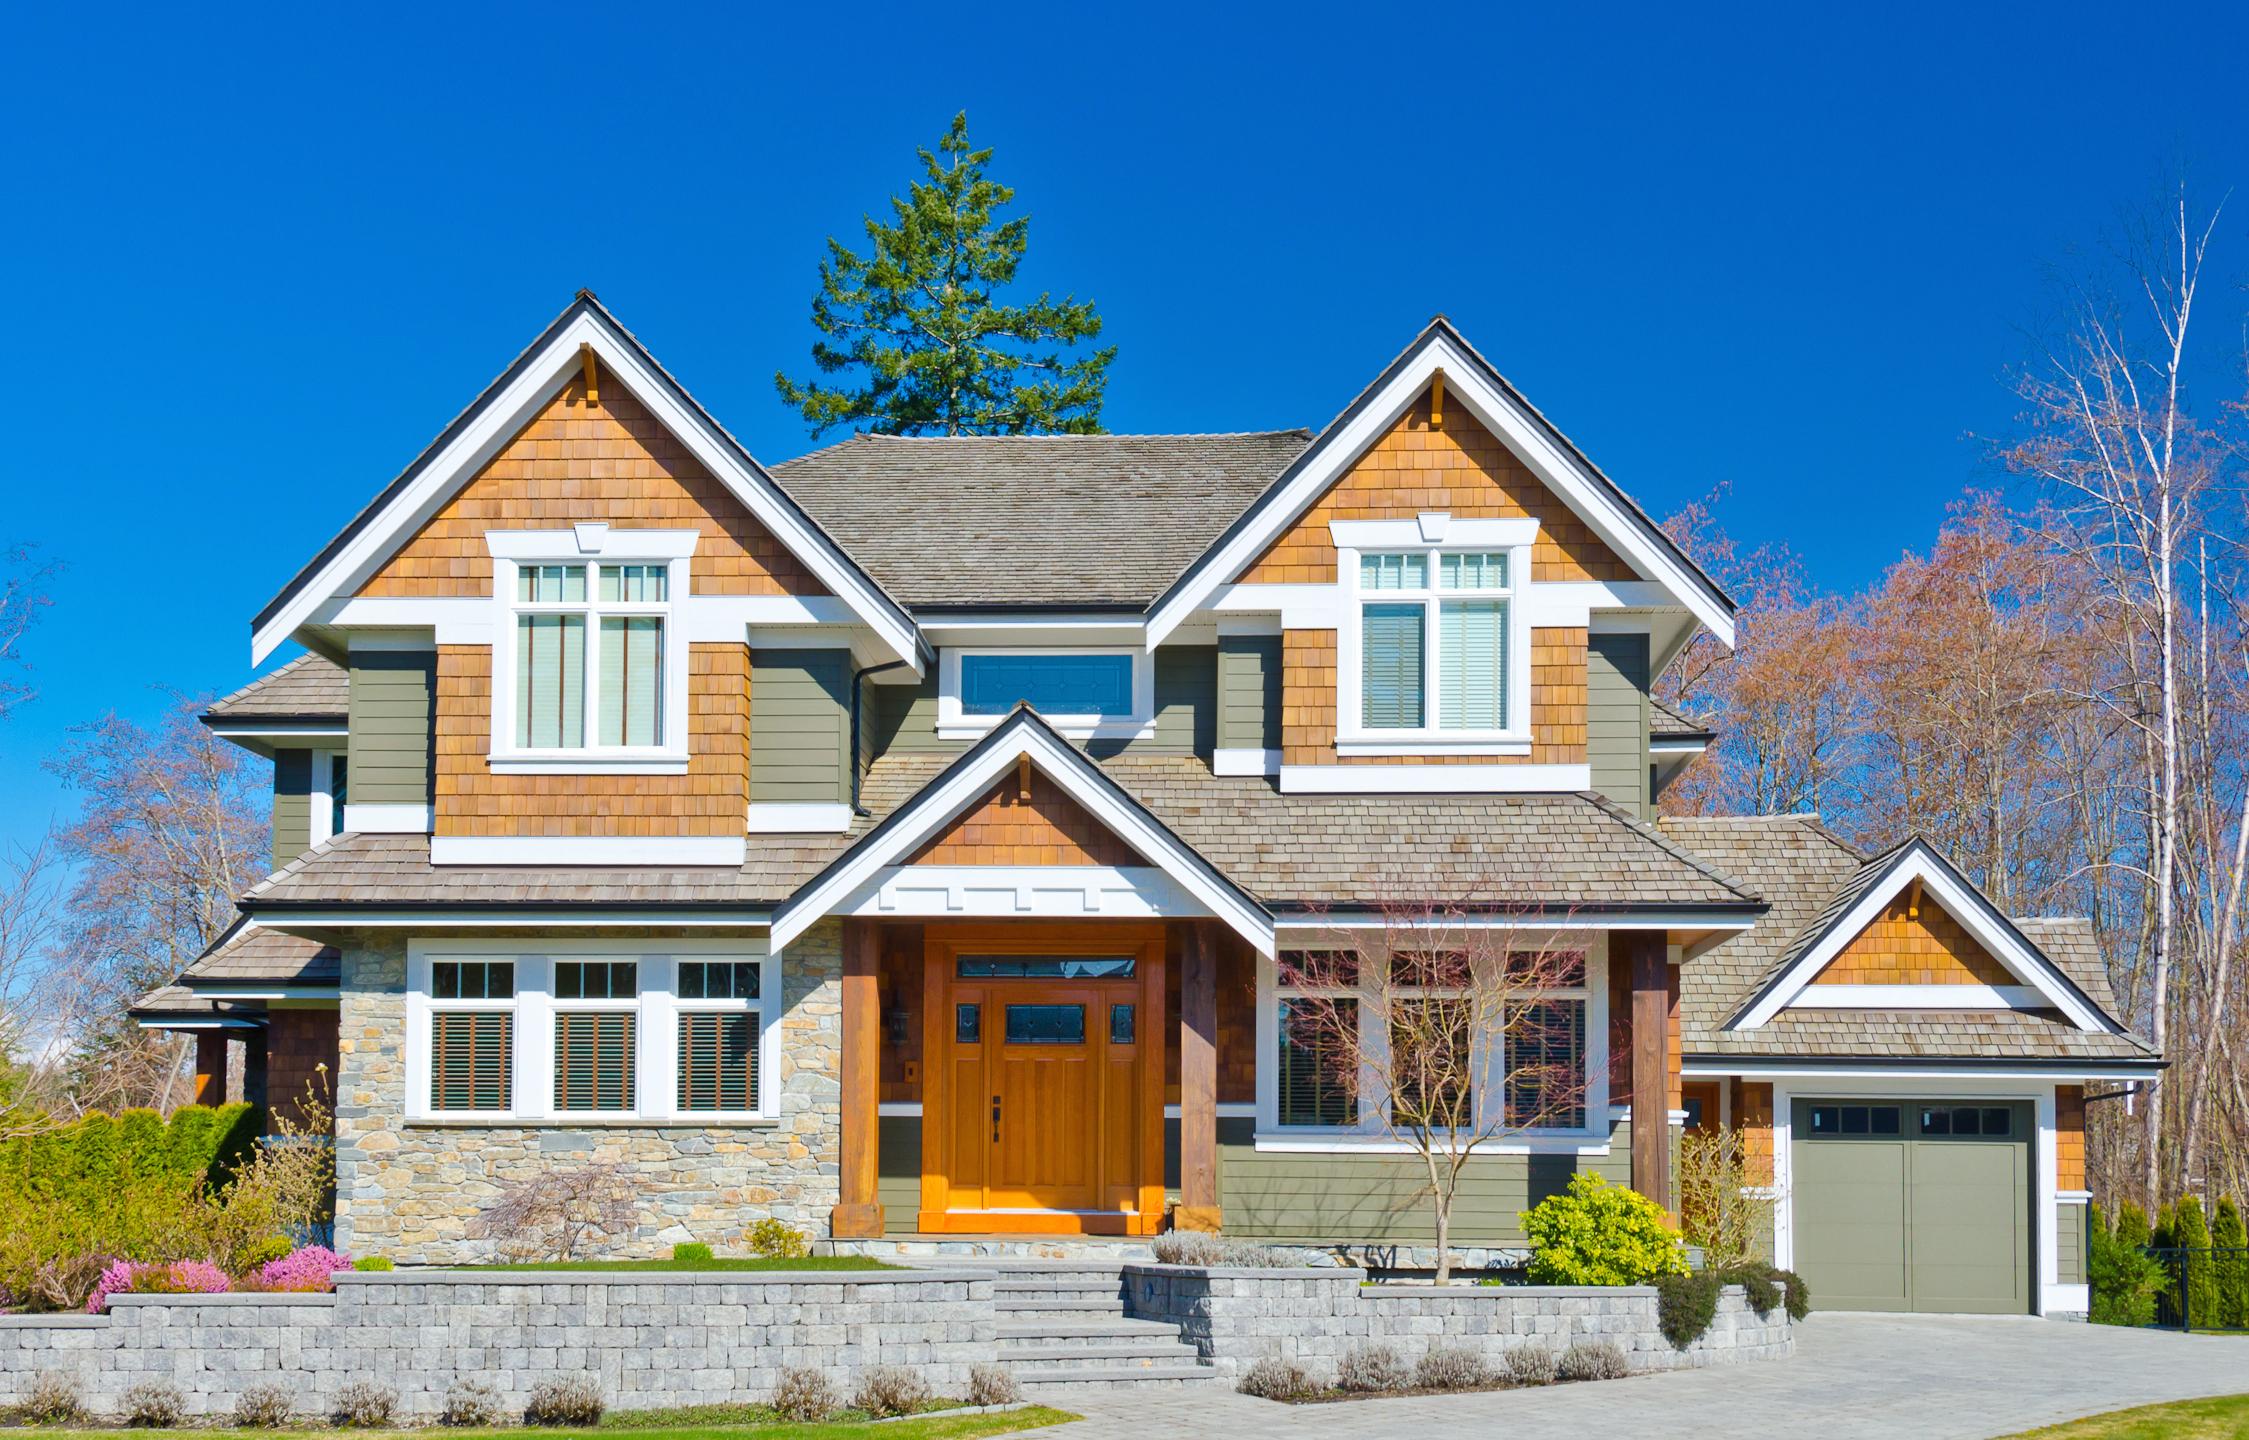 Spokane-Orchard-Prairie-School-District-Area-MLS-Homes ...